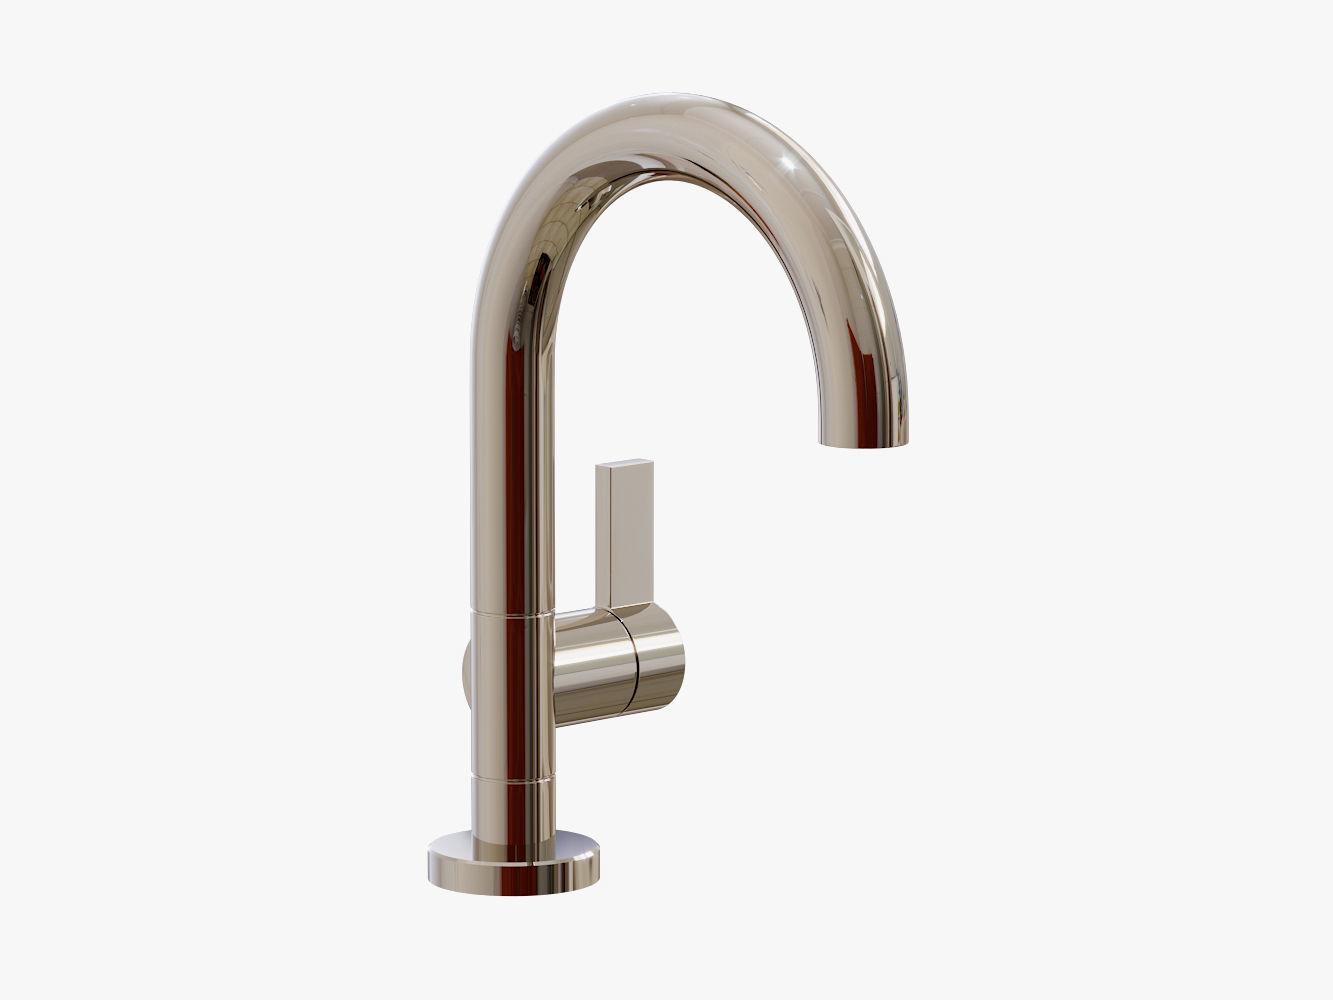 3D Kallista - One Single-Control Sink Faucet - P24409-00